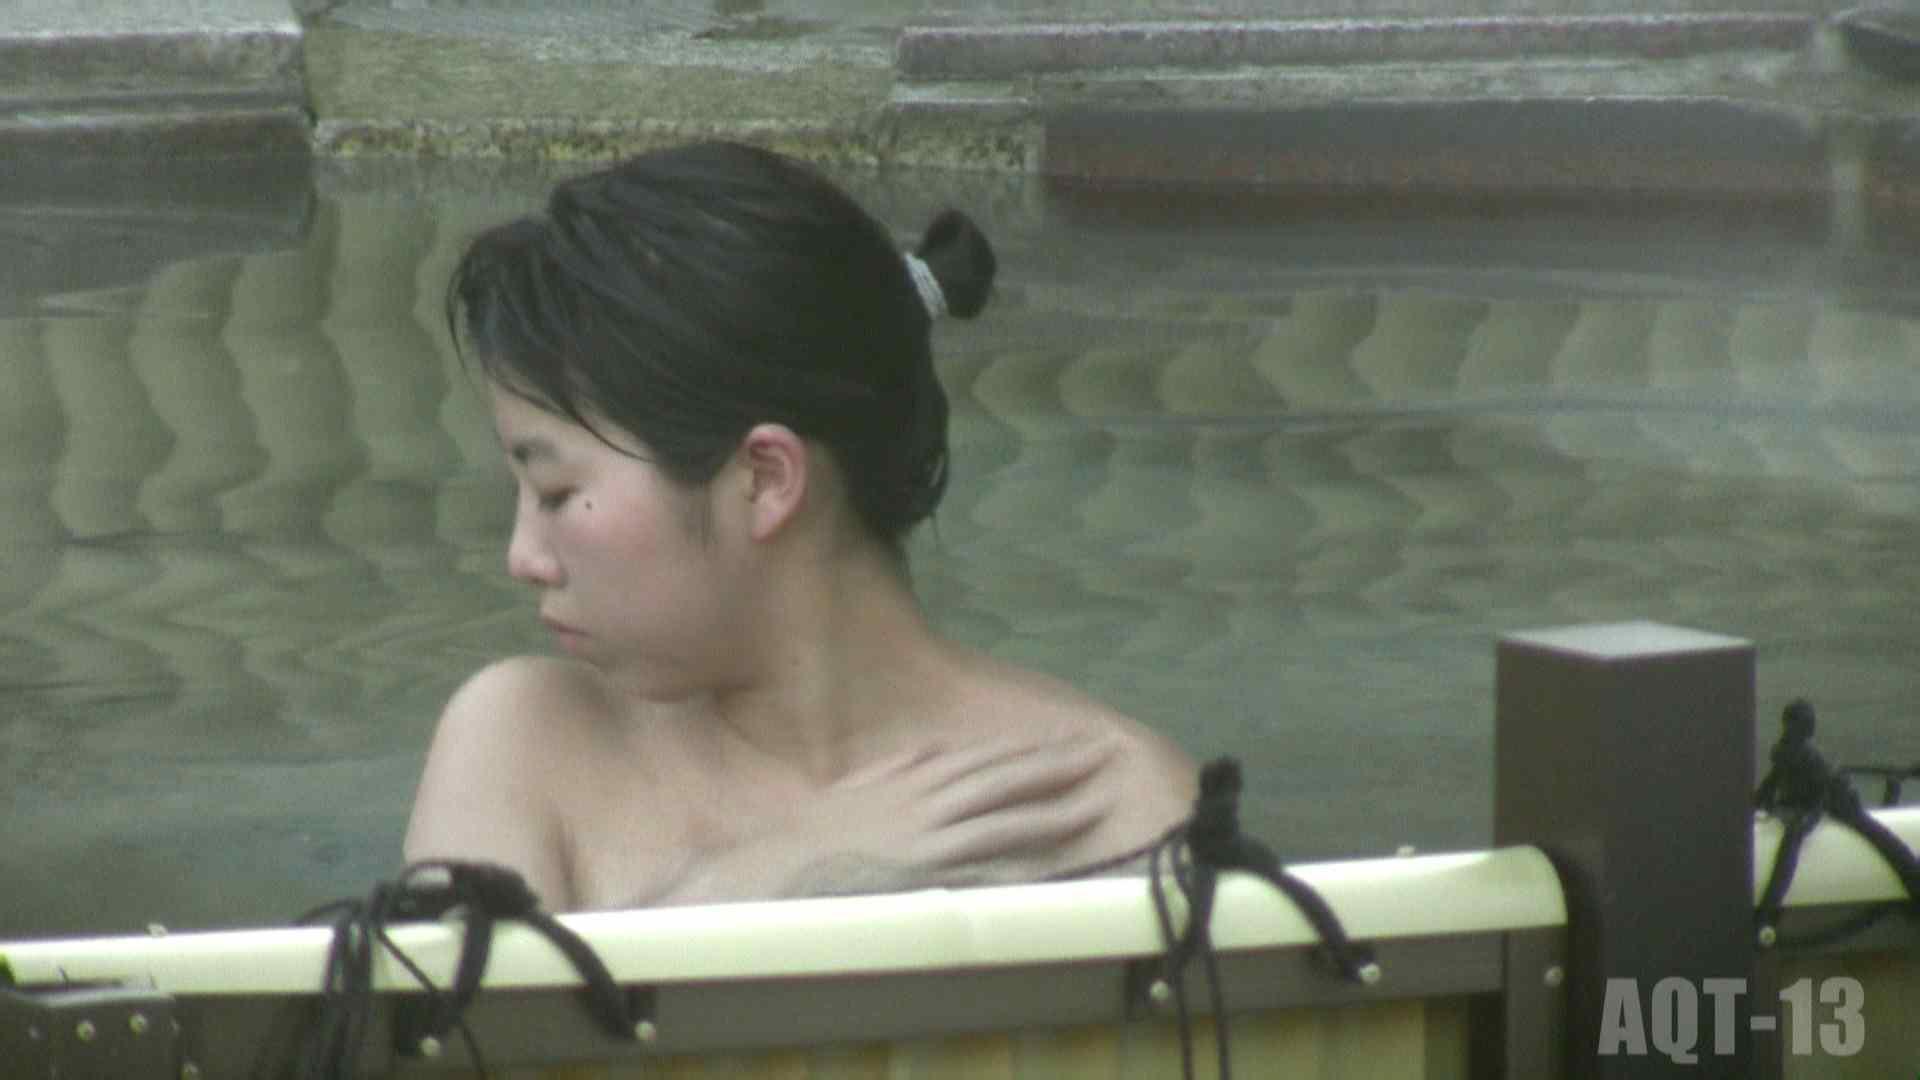 Aquaな露天風呂Vol.816 盗撮 盗み撮り動画キャプチャ 90連発 74